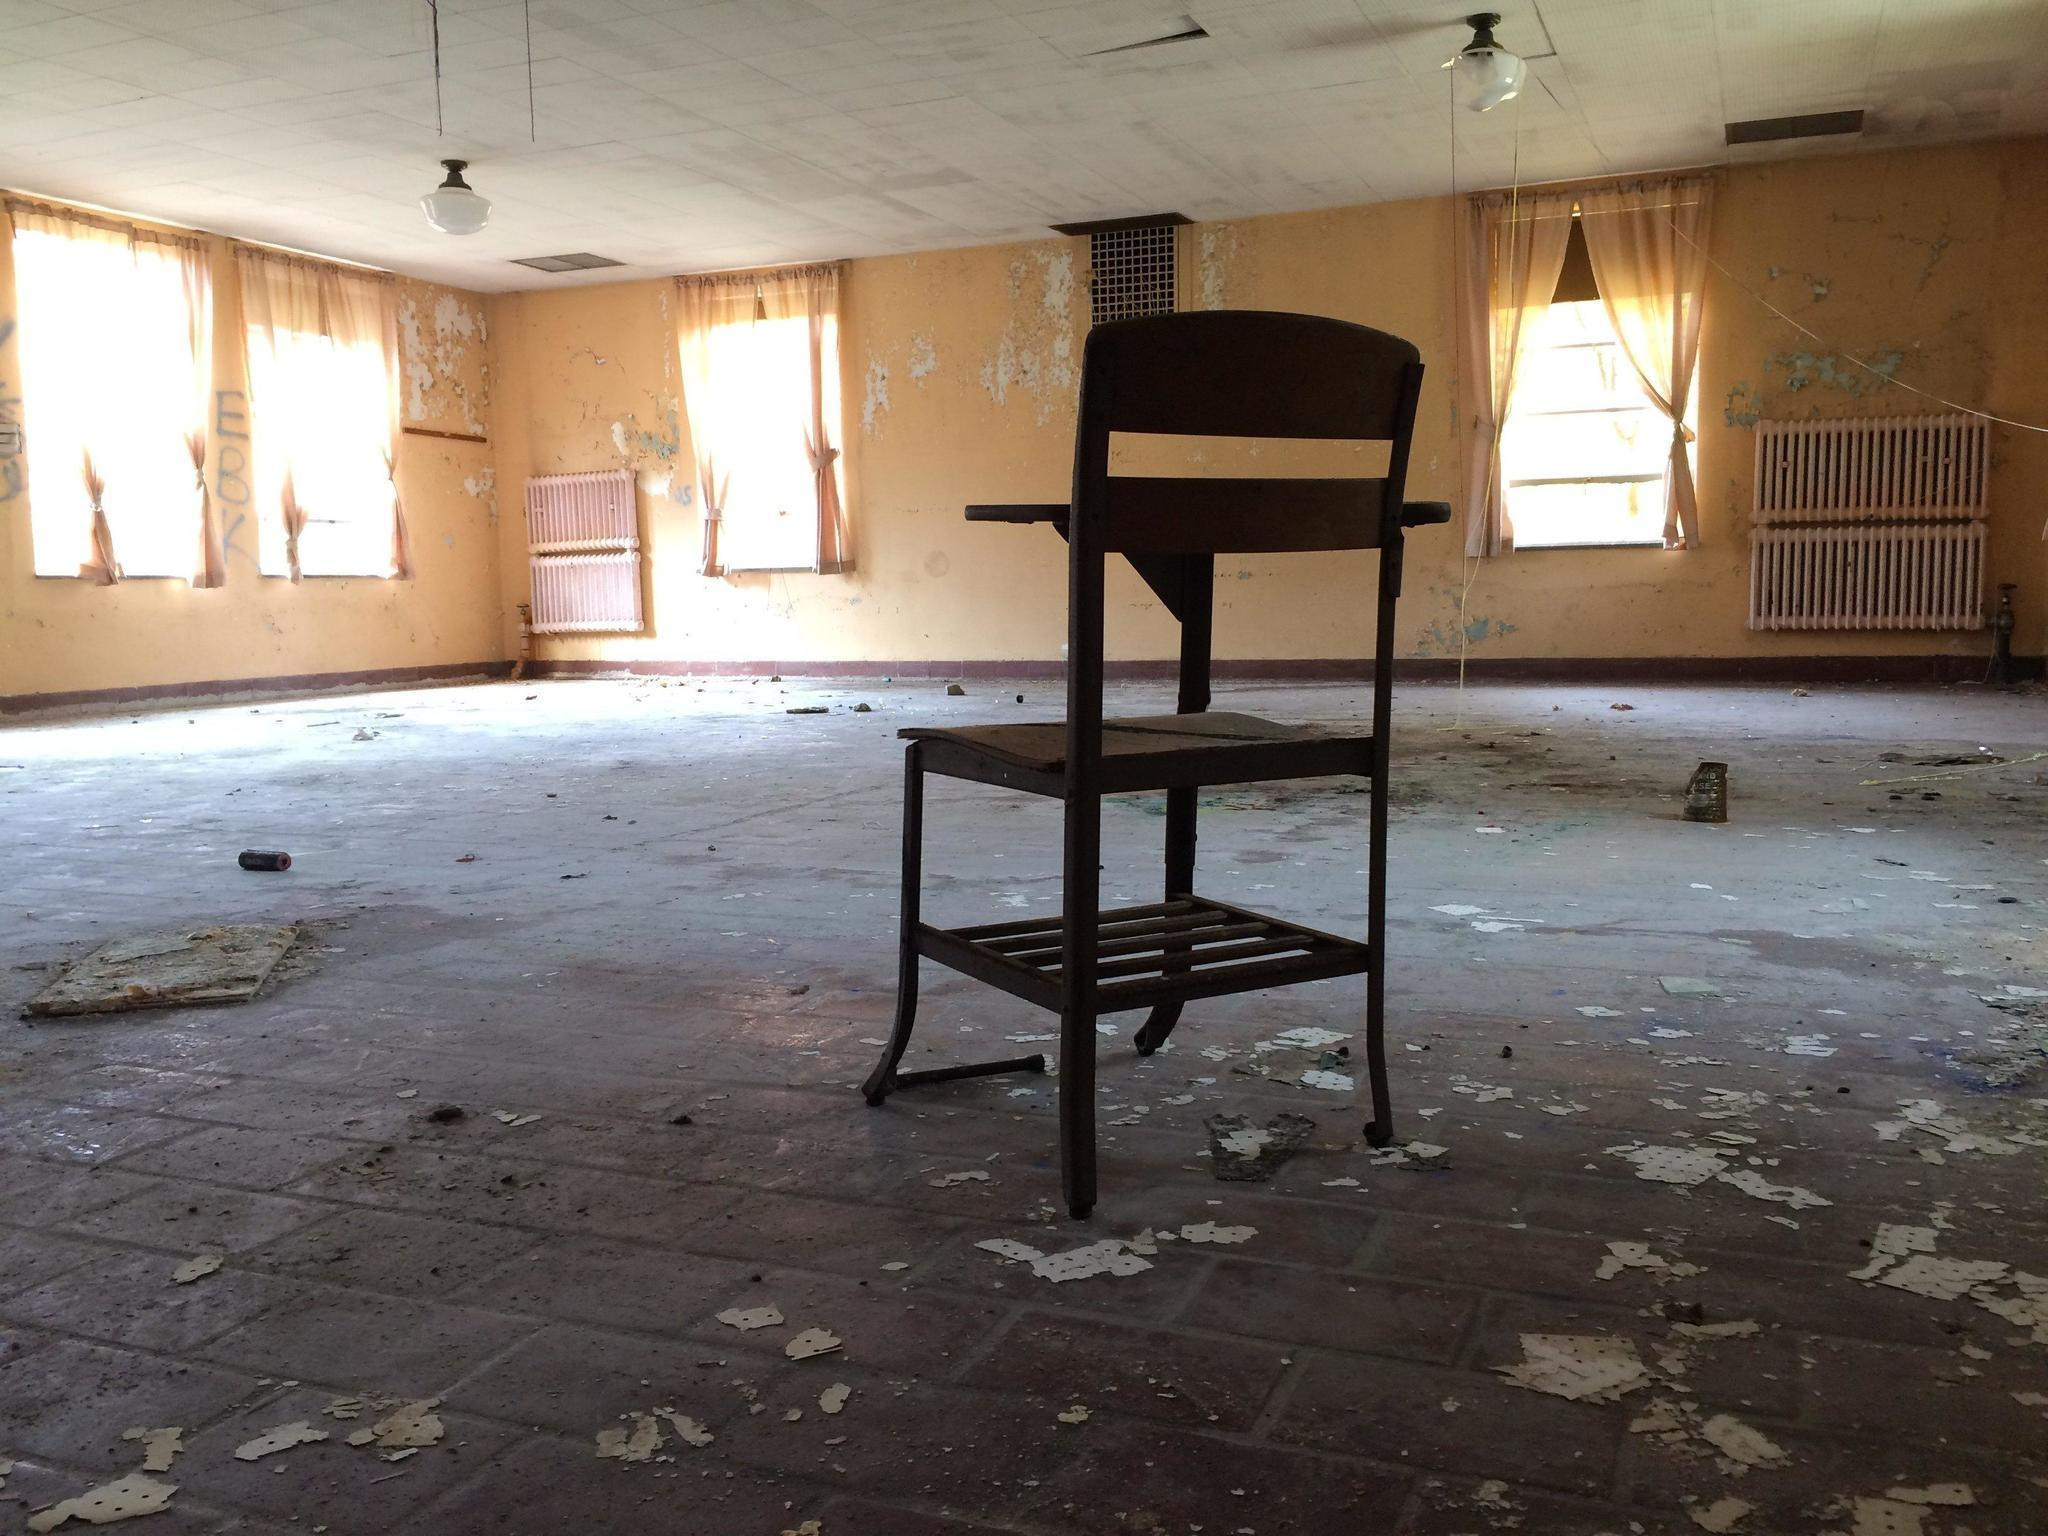 hardwood floor installation hartford ct of old uconn mental institution attracts filmmakers and the curious in old uconn mental institution attracts filmmakers and the curious hartford courant